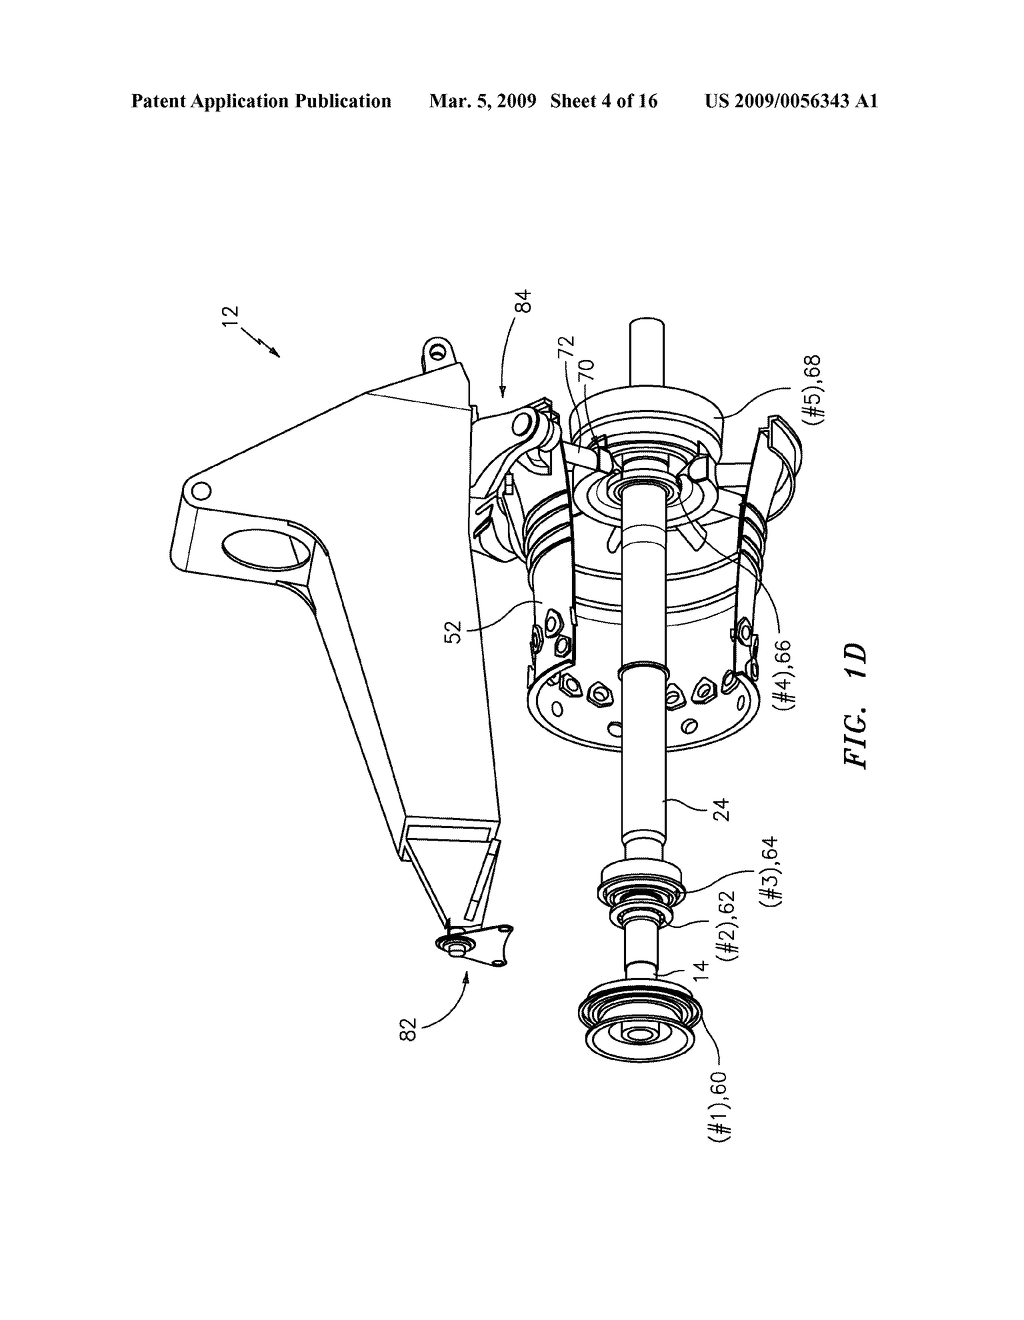 engine mounting configuration for a turbofan gas turbine engine rh patentsencyclopedia com